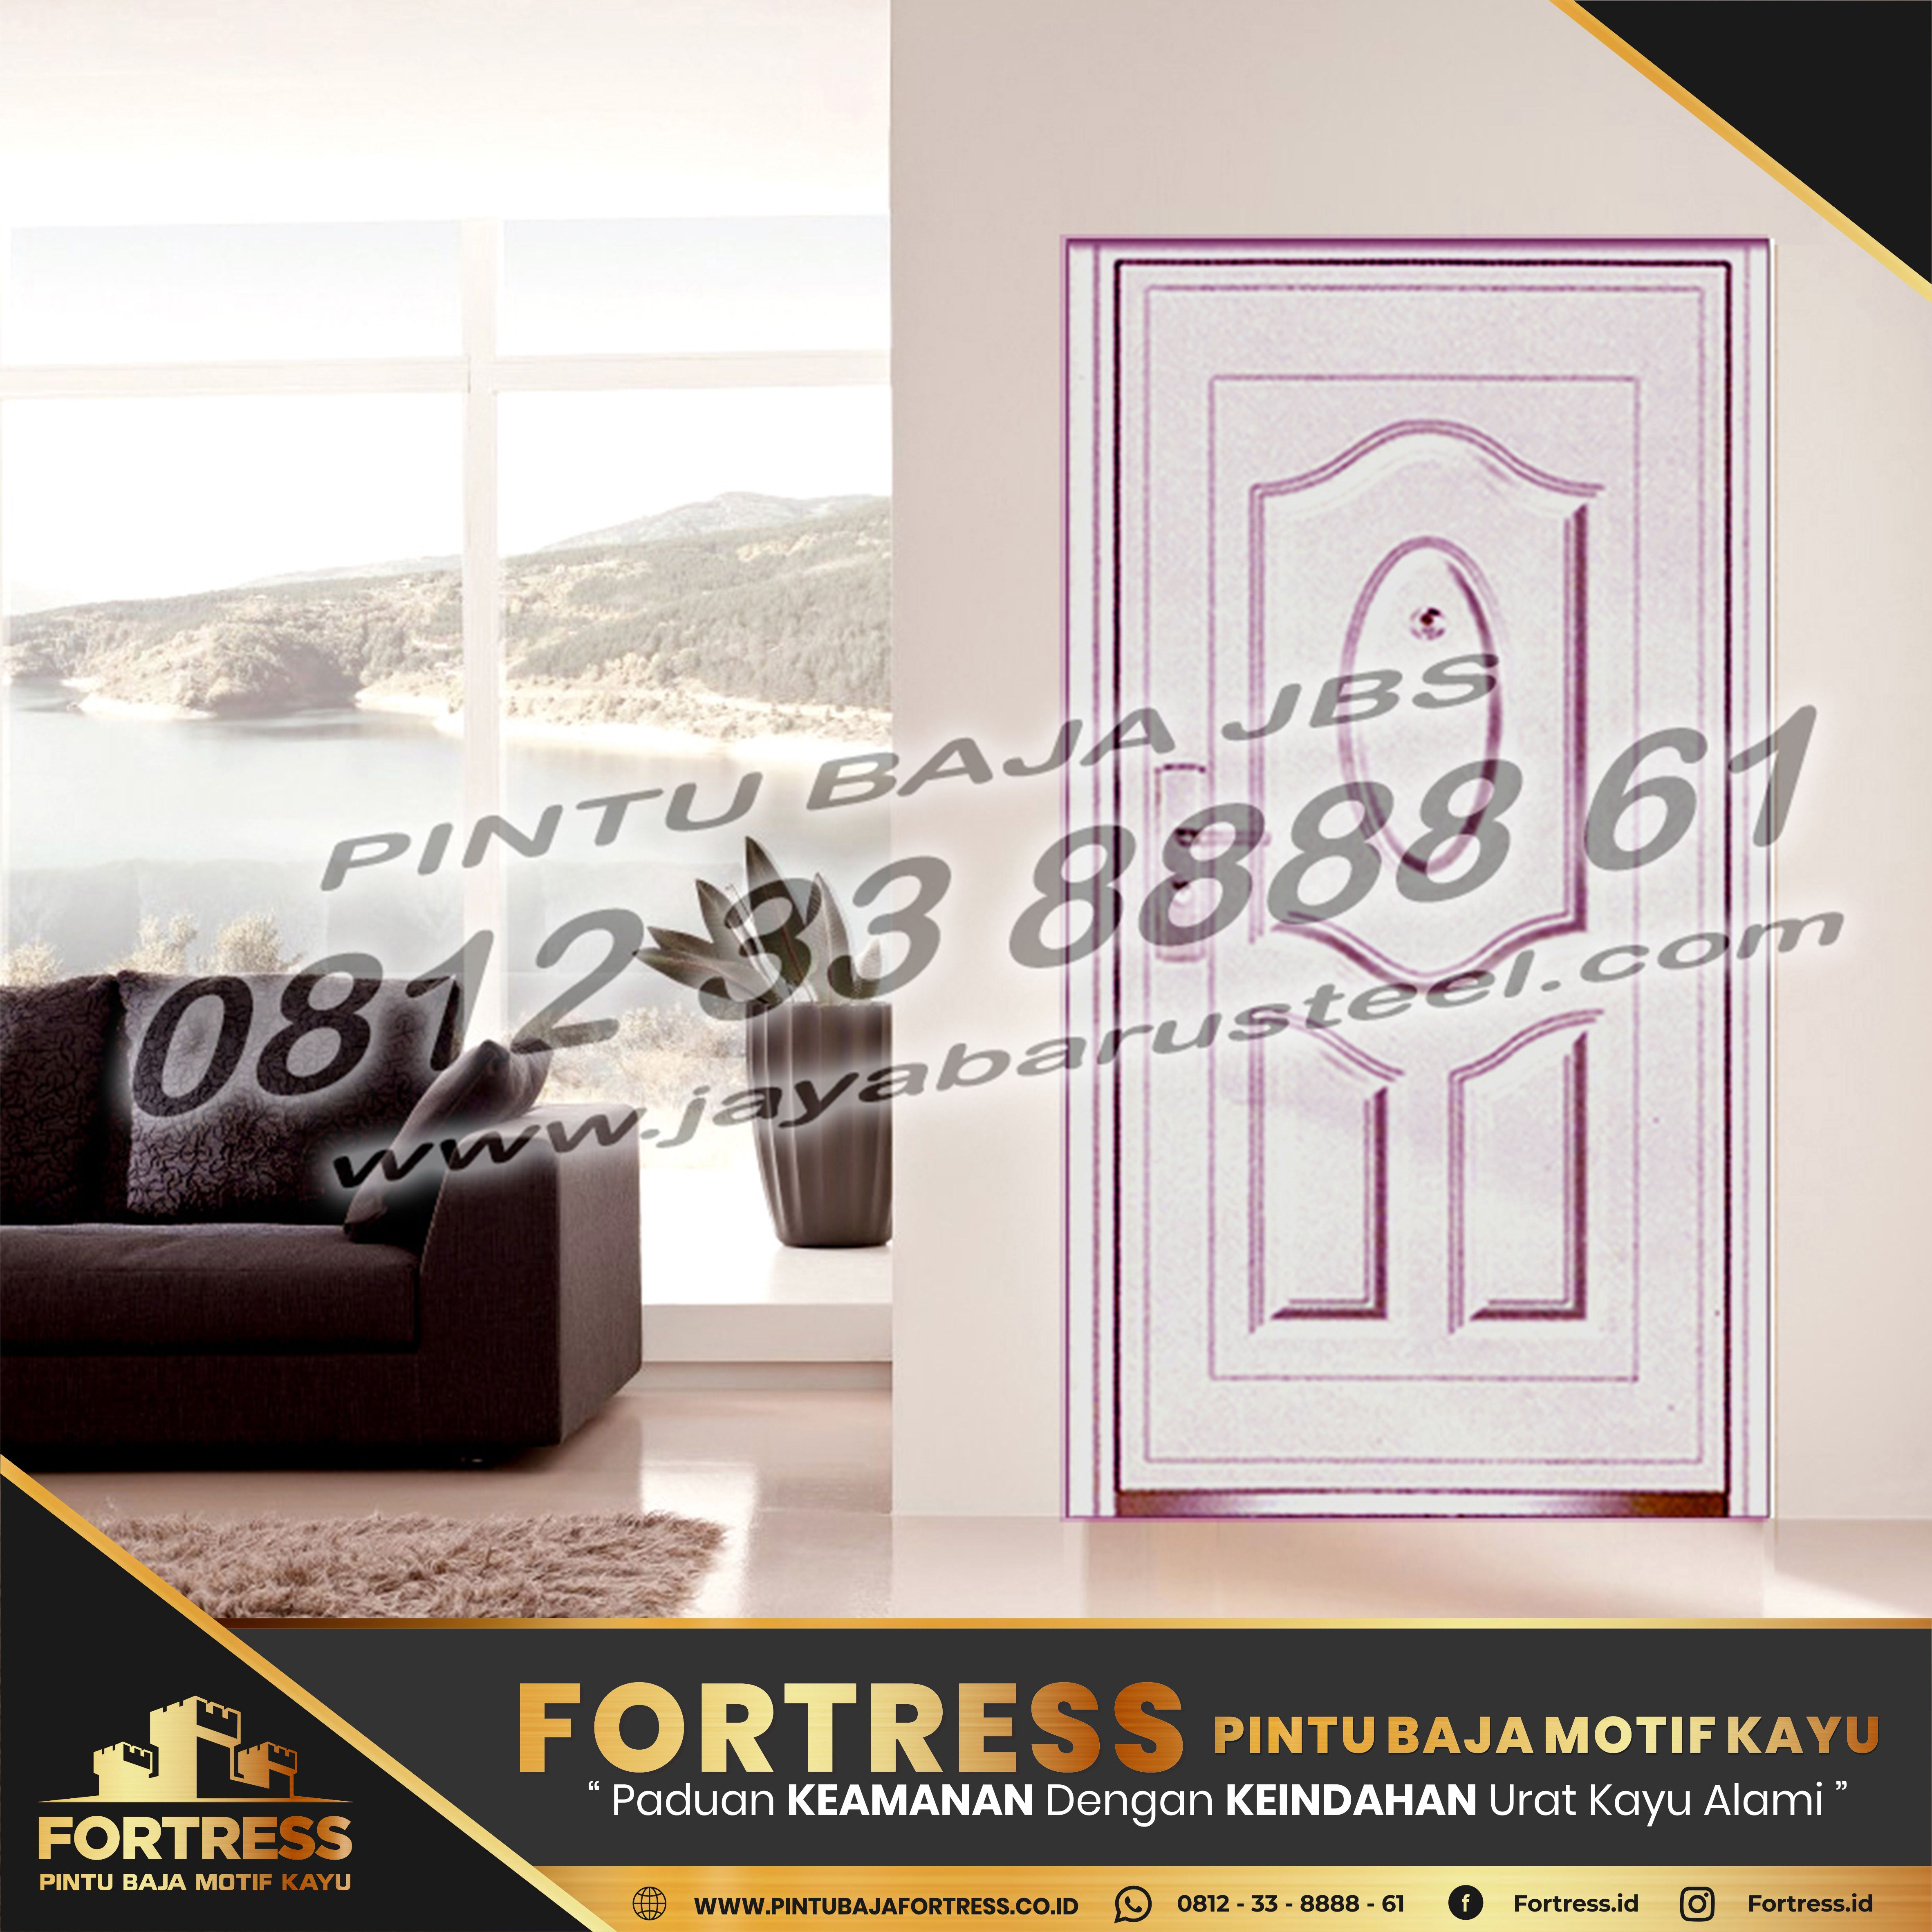 0812-91-6261-07 (FORTRESS) Lack of Steel Doors in Samarinda, …